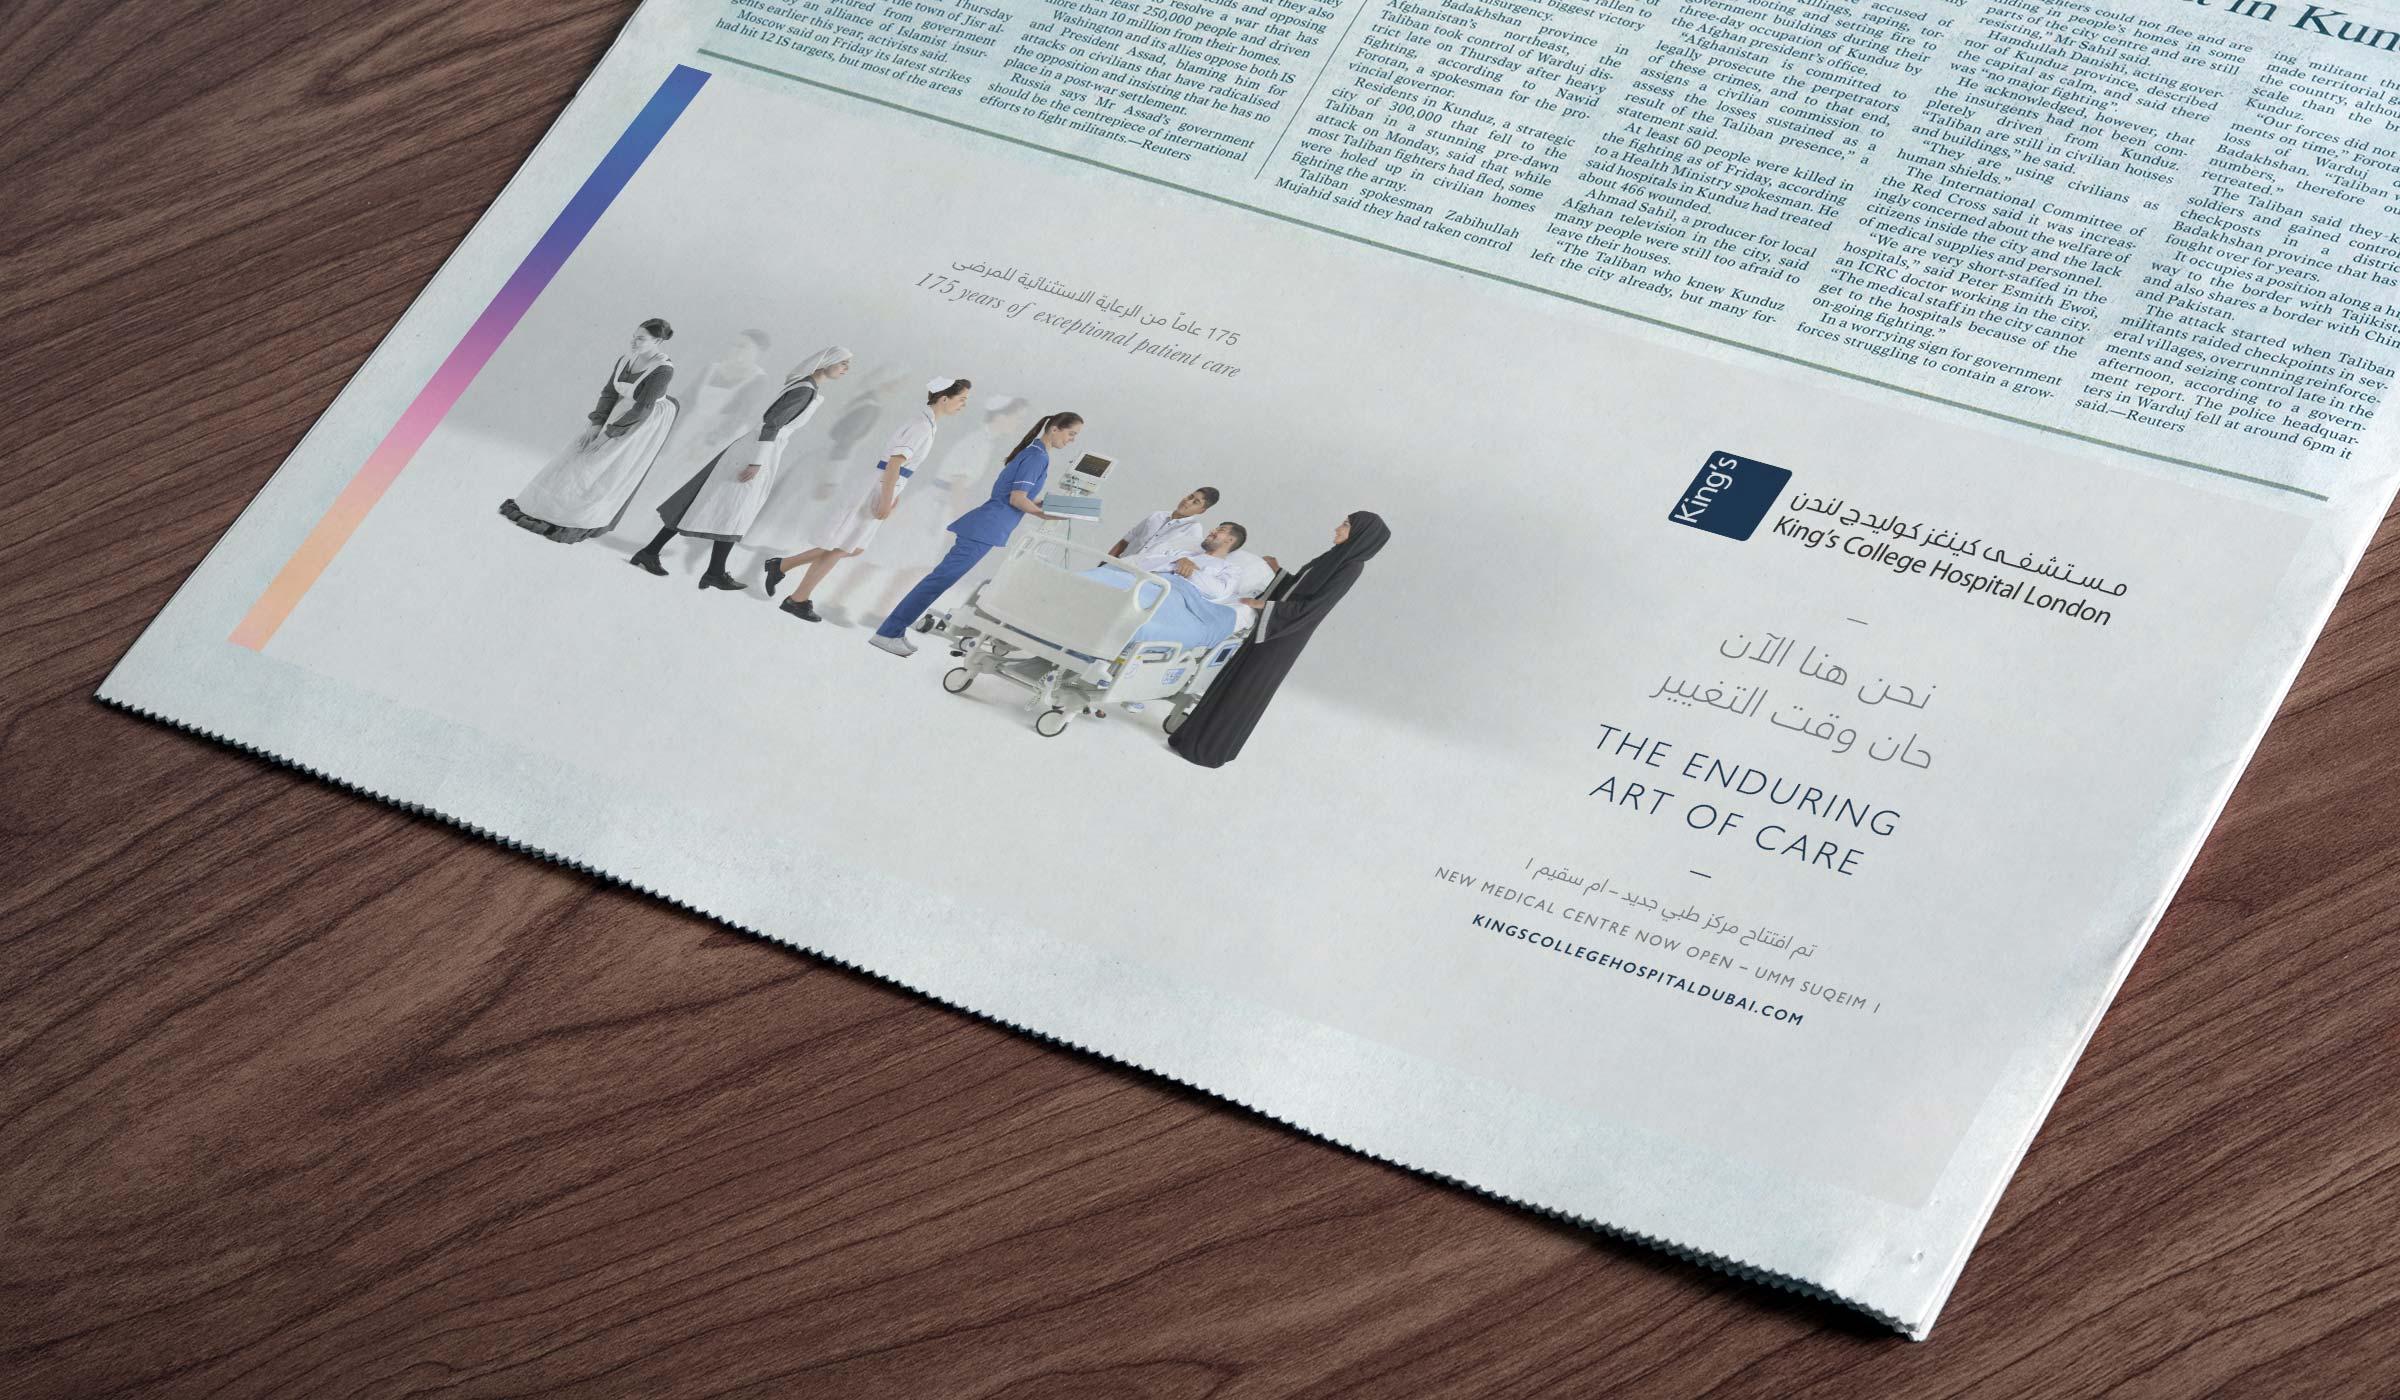 Kings College Dubai Campaign, newspaper advert